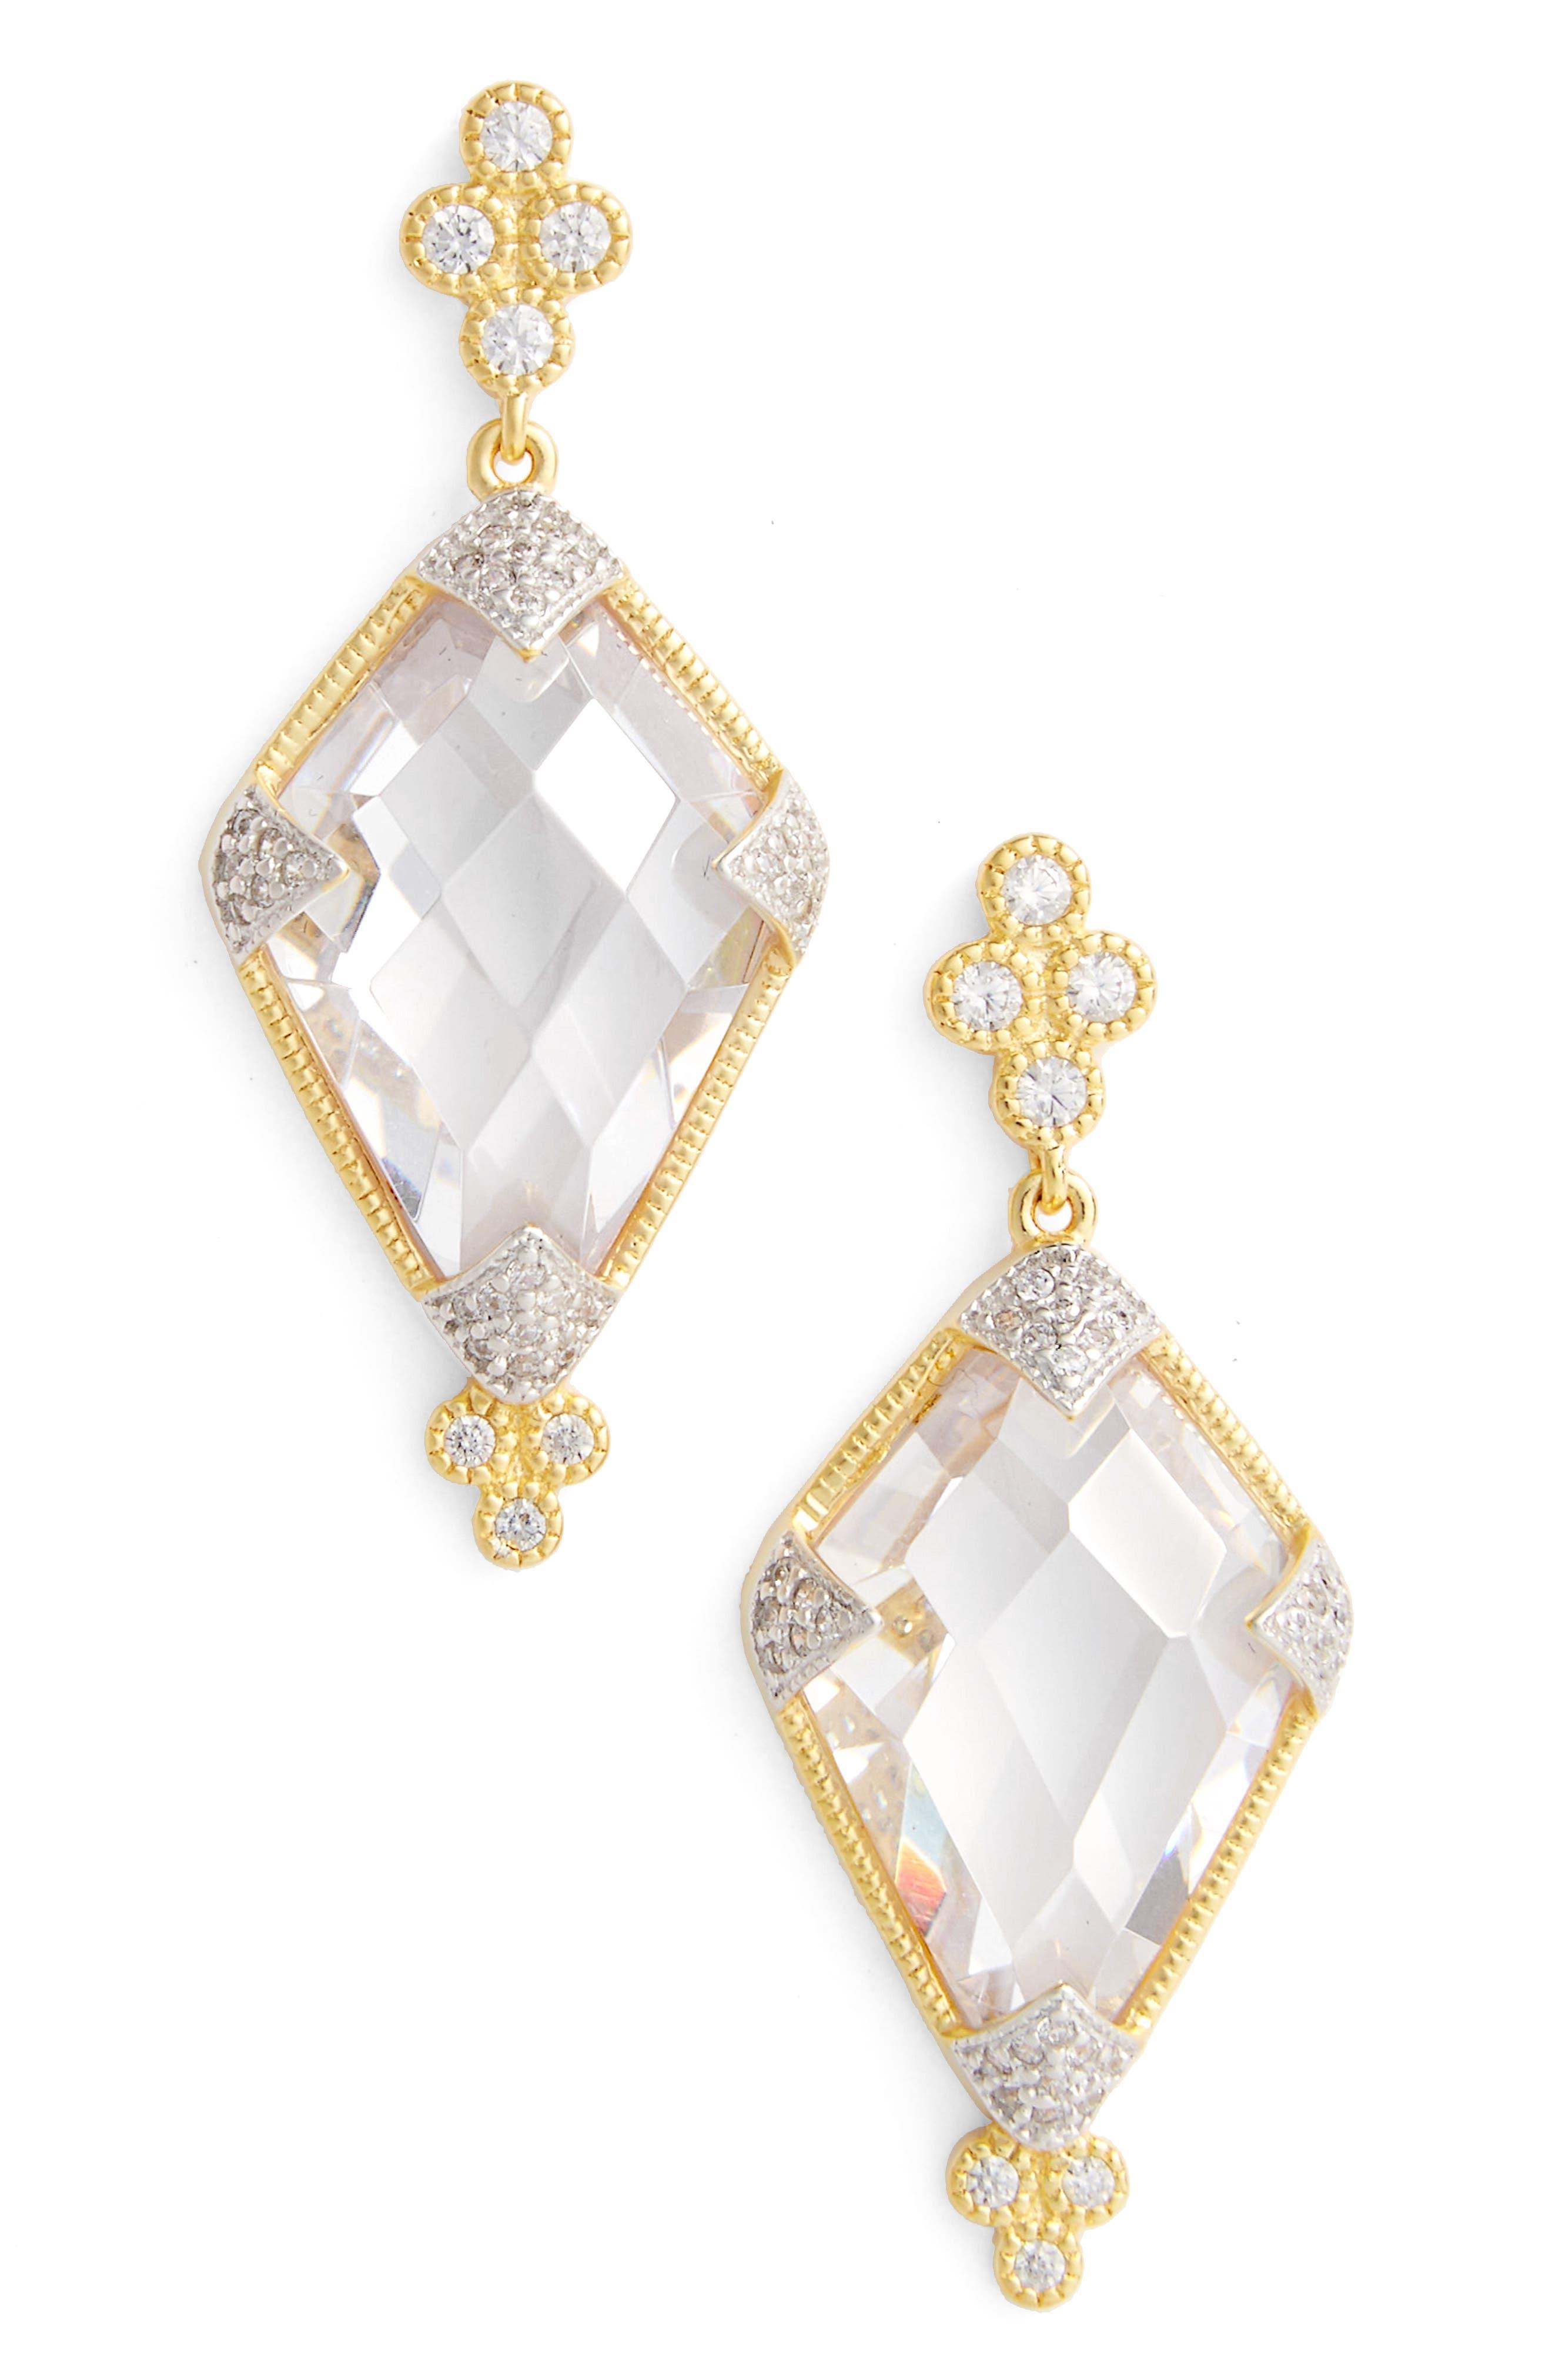 FREIDA ROTHMAN Visionary Fusion Cubic Zirconia Drop Earrings